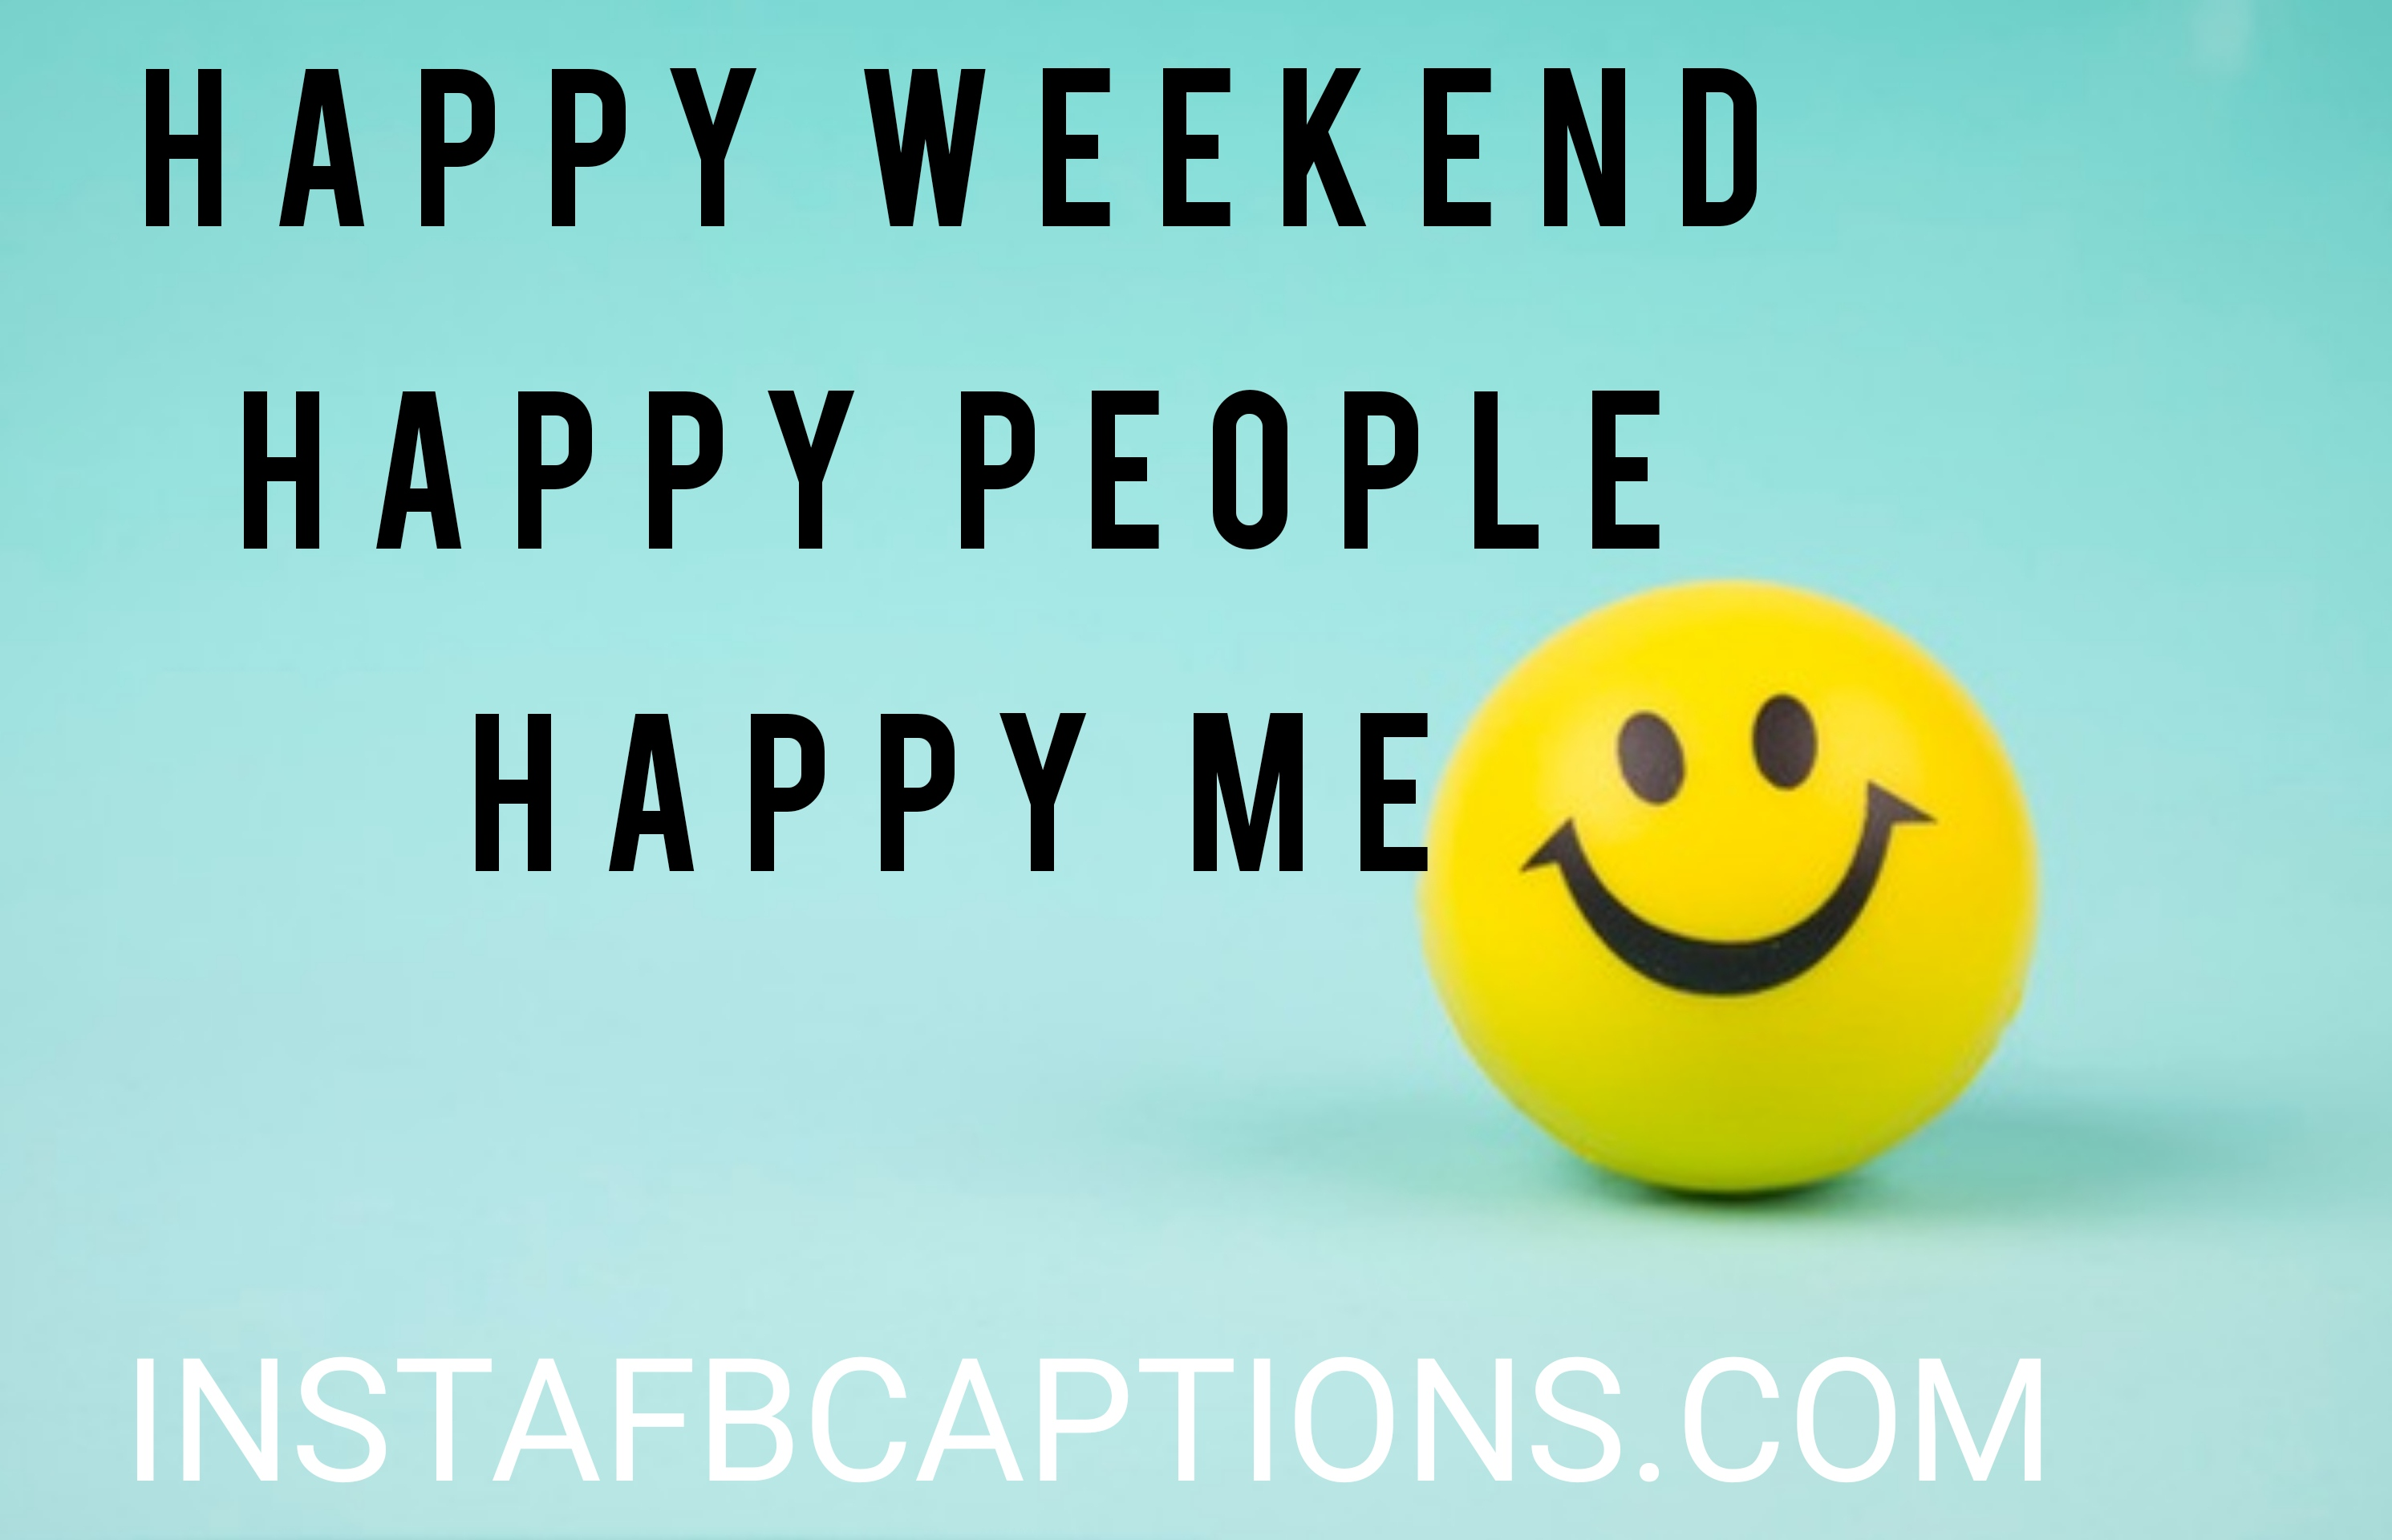 Happy Weekend Happy People Happy Me  - happy weekend happy people happy me - 500+ WEEKEND Instagram Captions 2021